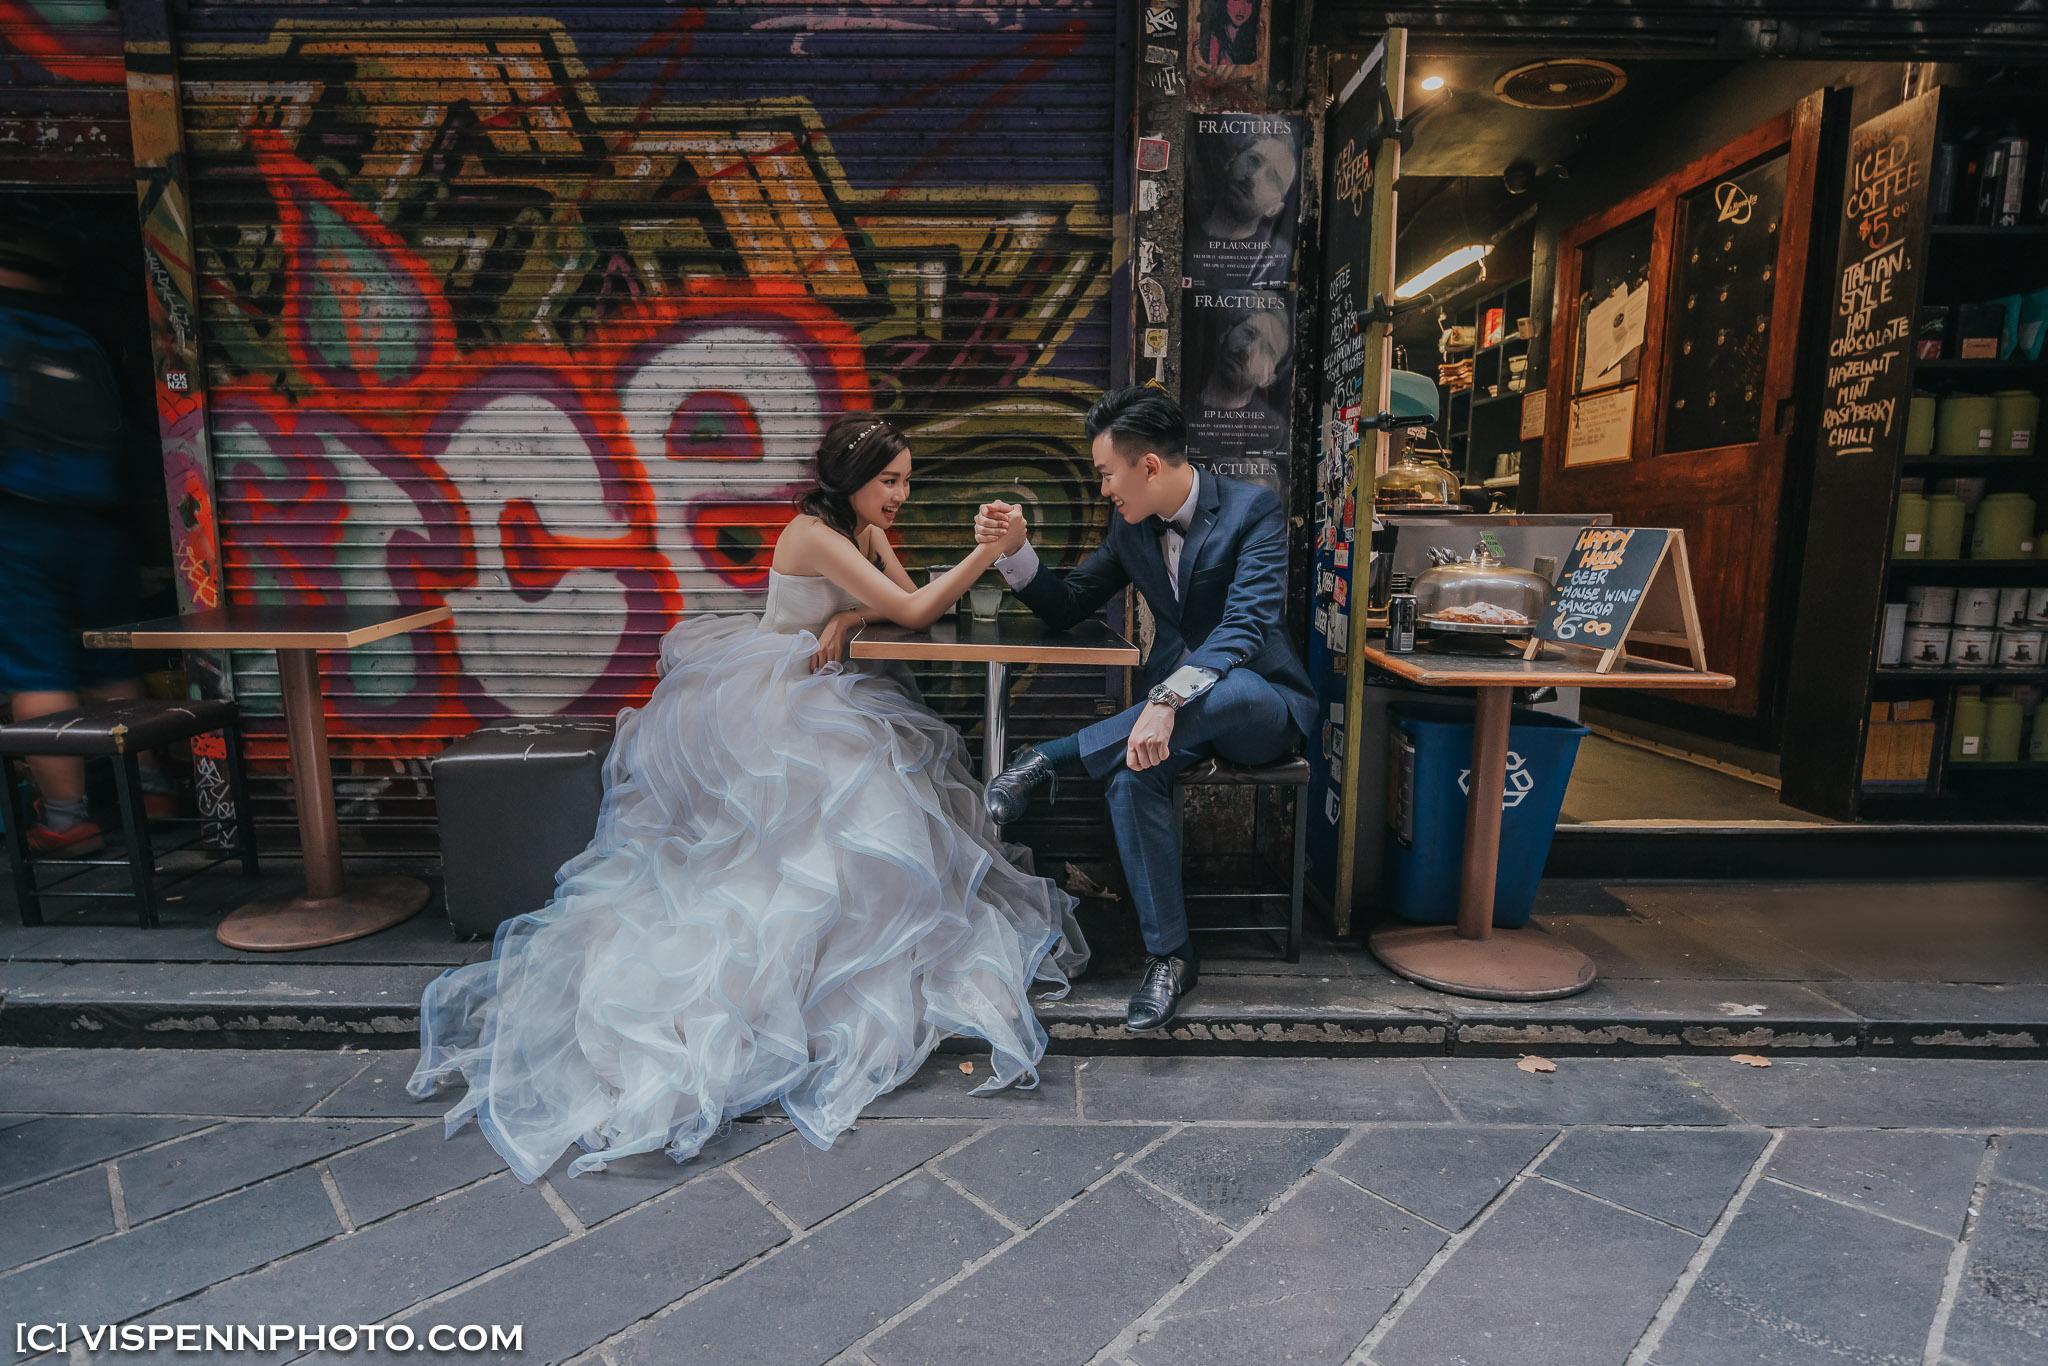 PRE WEDDING Photography Melbourne VISPENN 墨尔本 婚纱照 结婚照 婚纱摄影 AndyCHEN 5787 A7R2 VISPENN